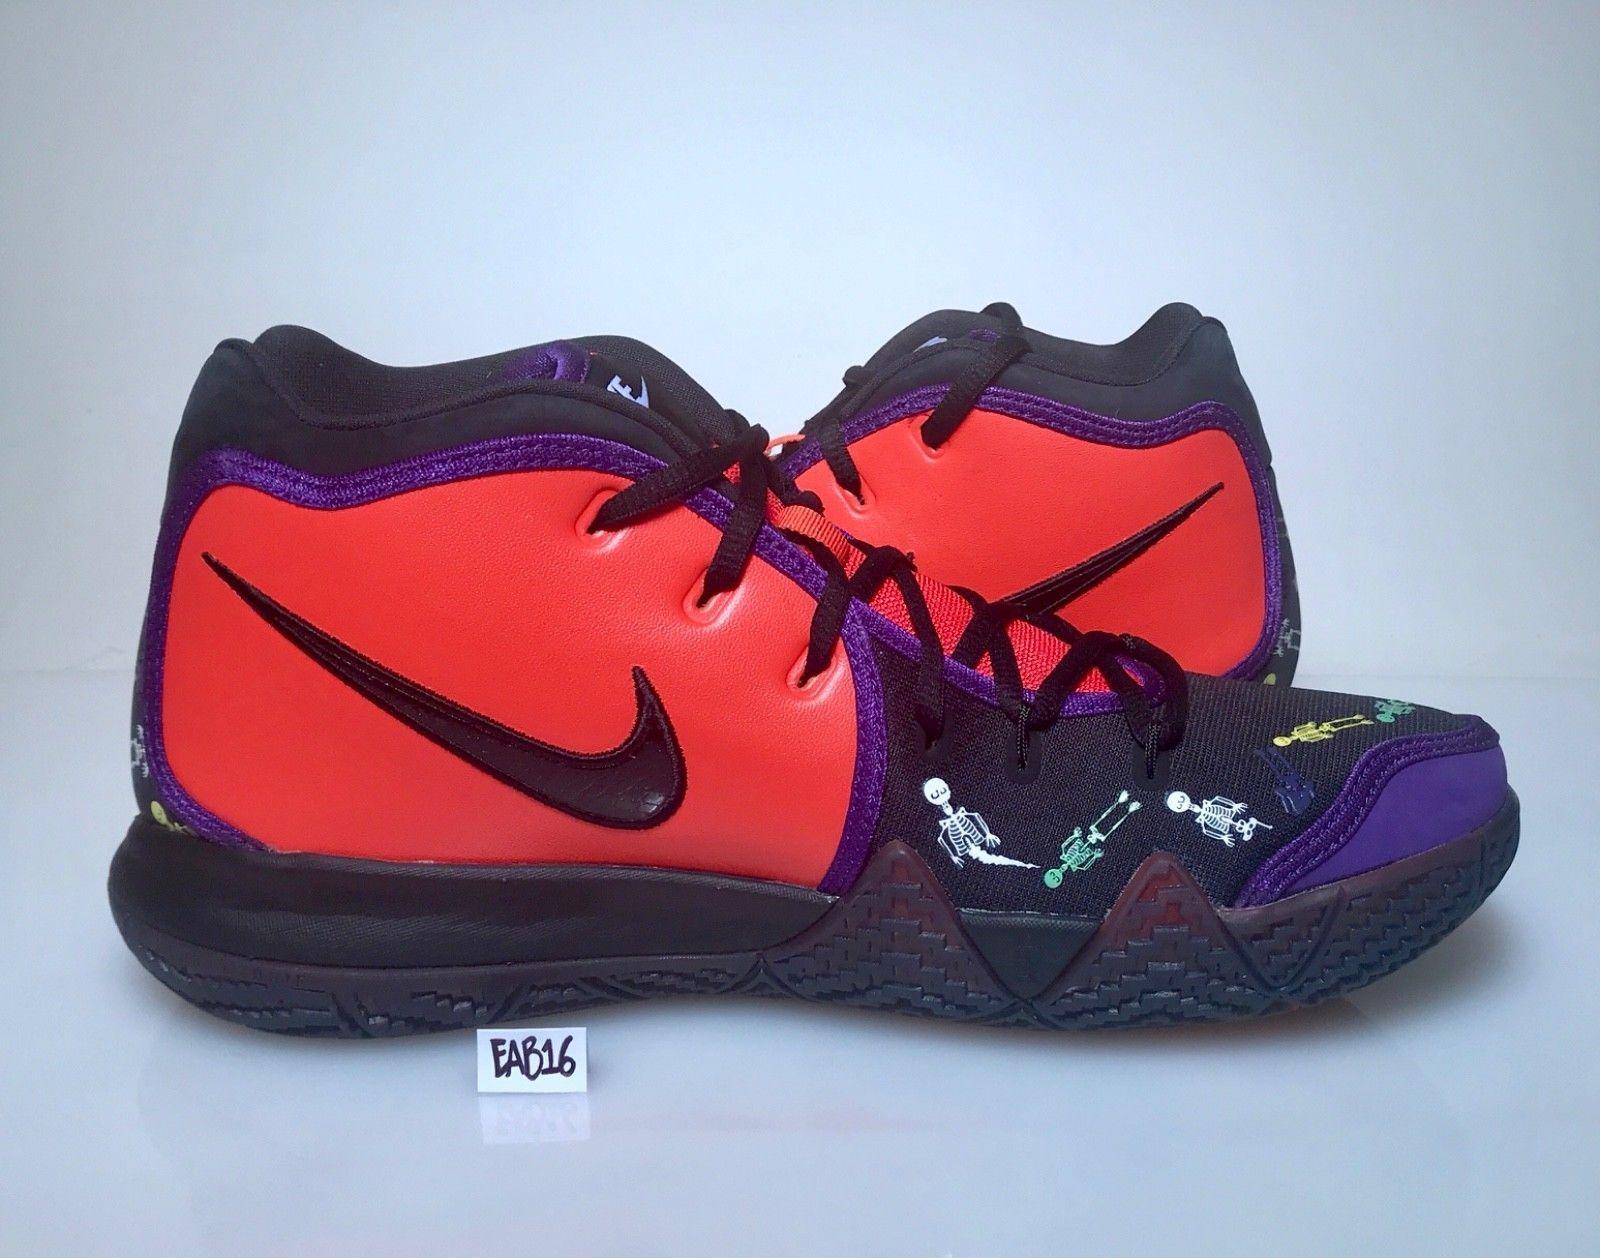 5275c1c5a6f3 Nike Kyrie Irving 4 IV Day Of The Dead DOTD TV PE 1 Team Orange Black